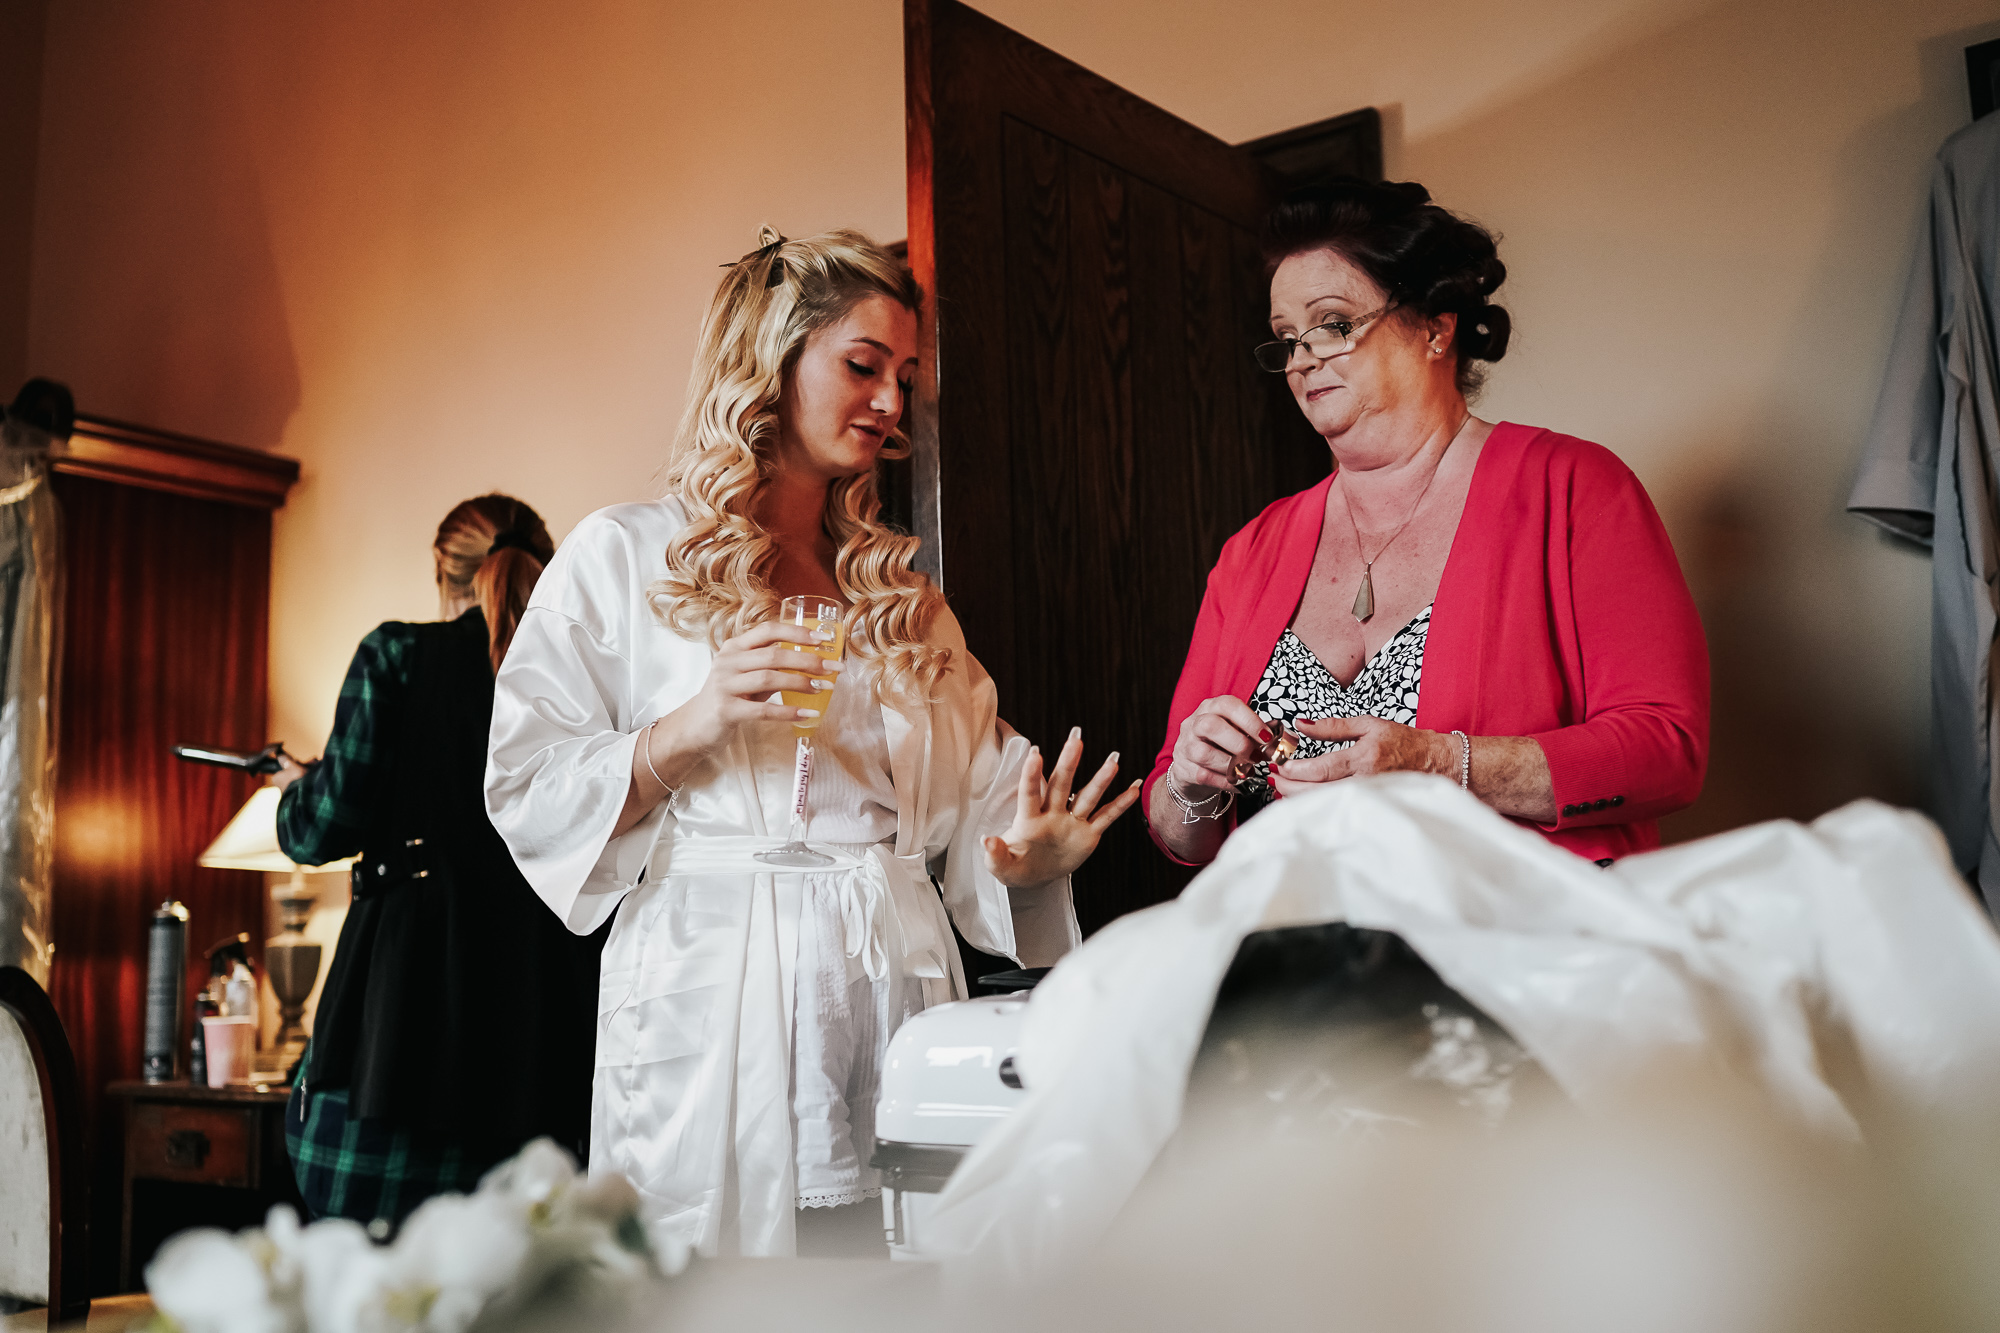 Peckforton Castle wedding photography cheshire wedding photographer (3 of 57).jpg